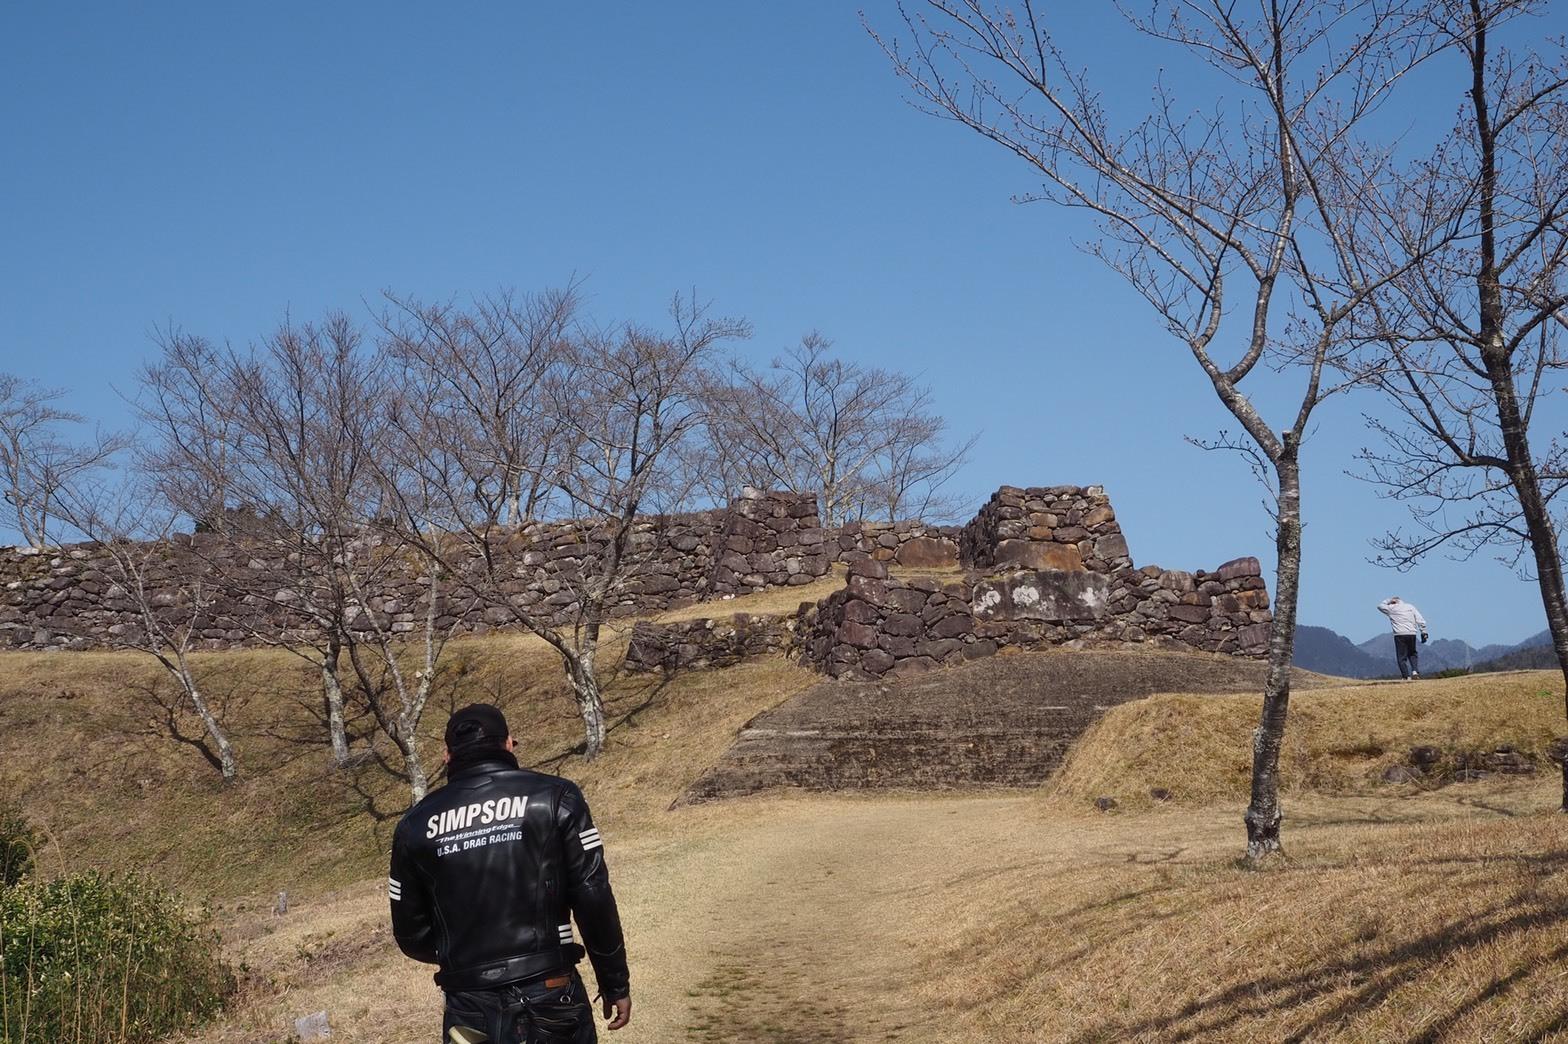 harleydavidson-motorcycle-touring-blog-kumano-mie-akagi-castleruins-shimagon.jpg